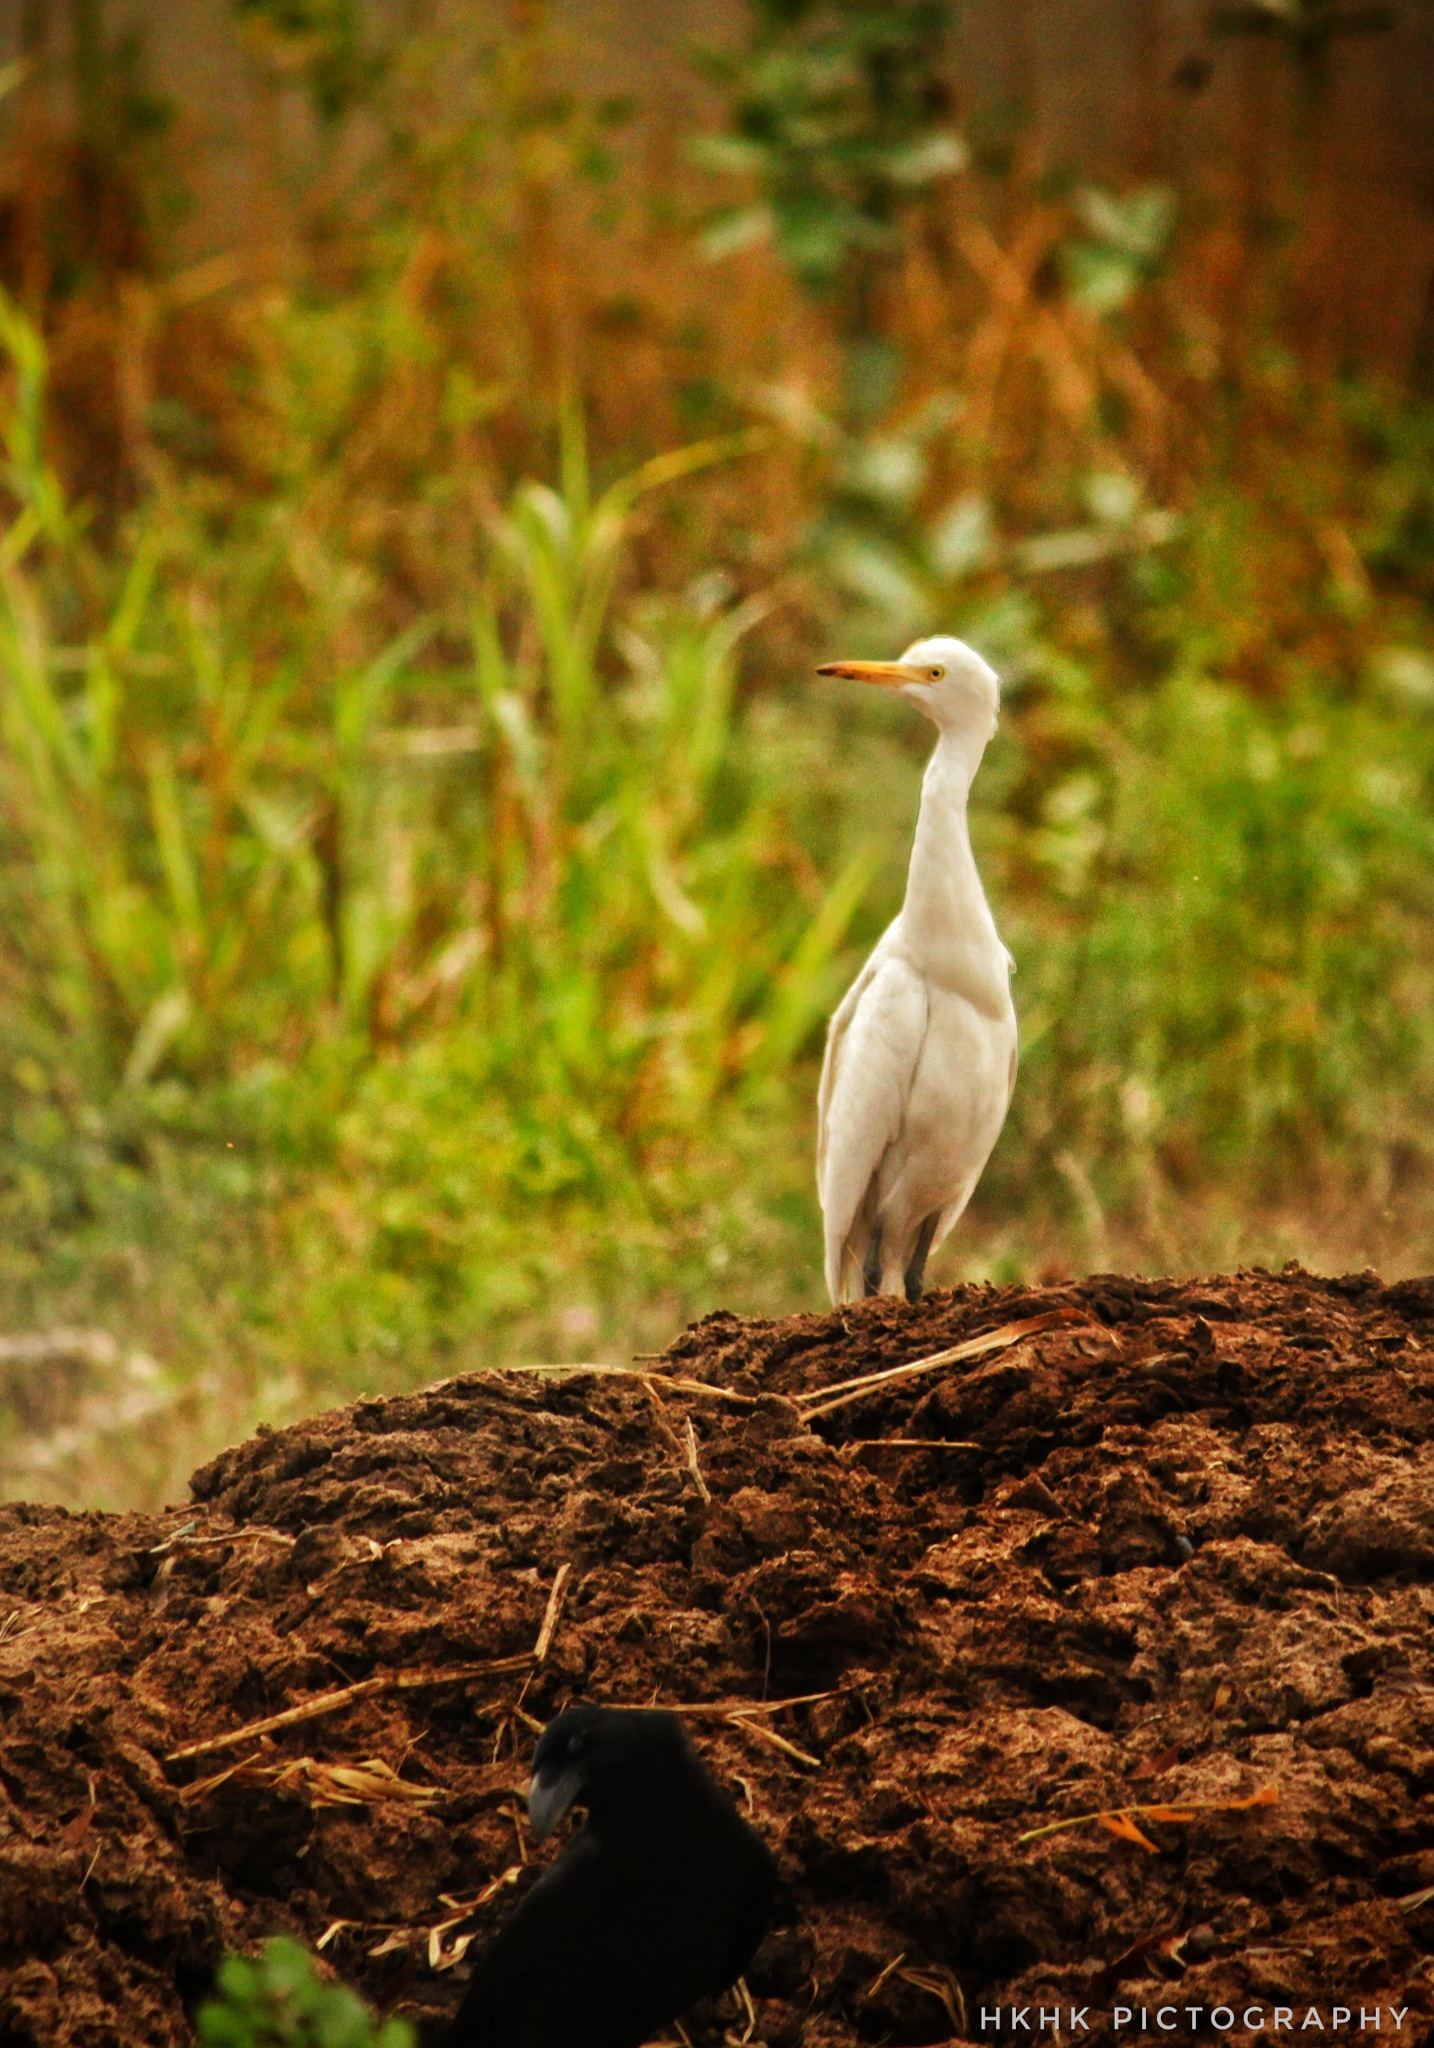 bird by Hari Khk